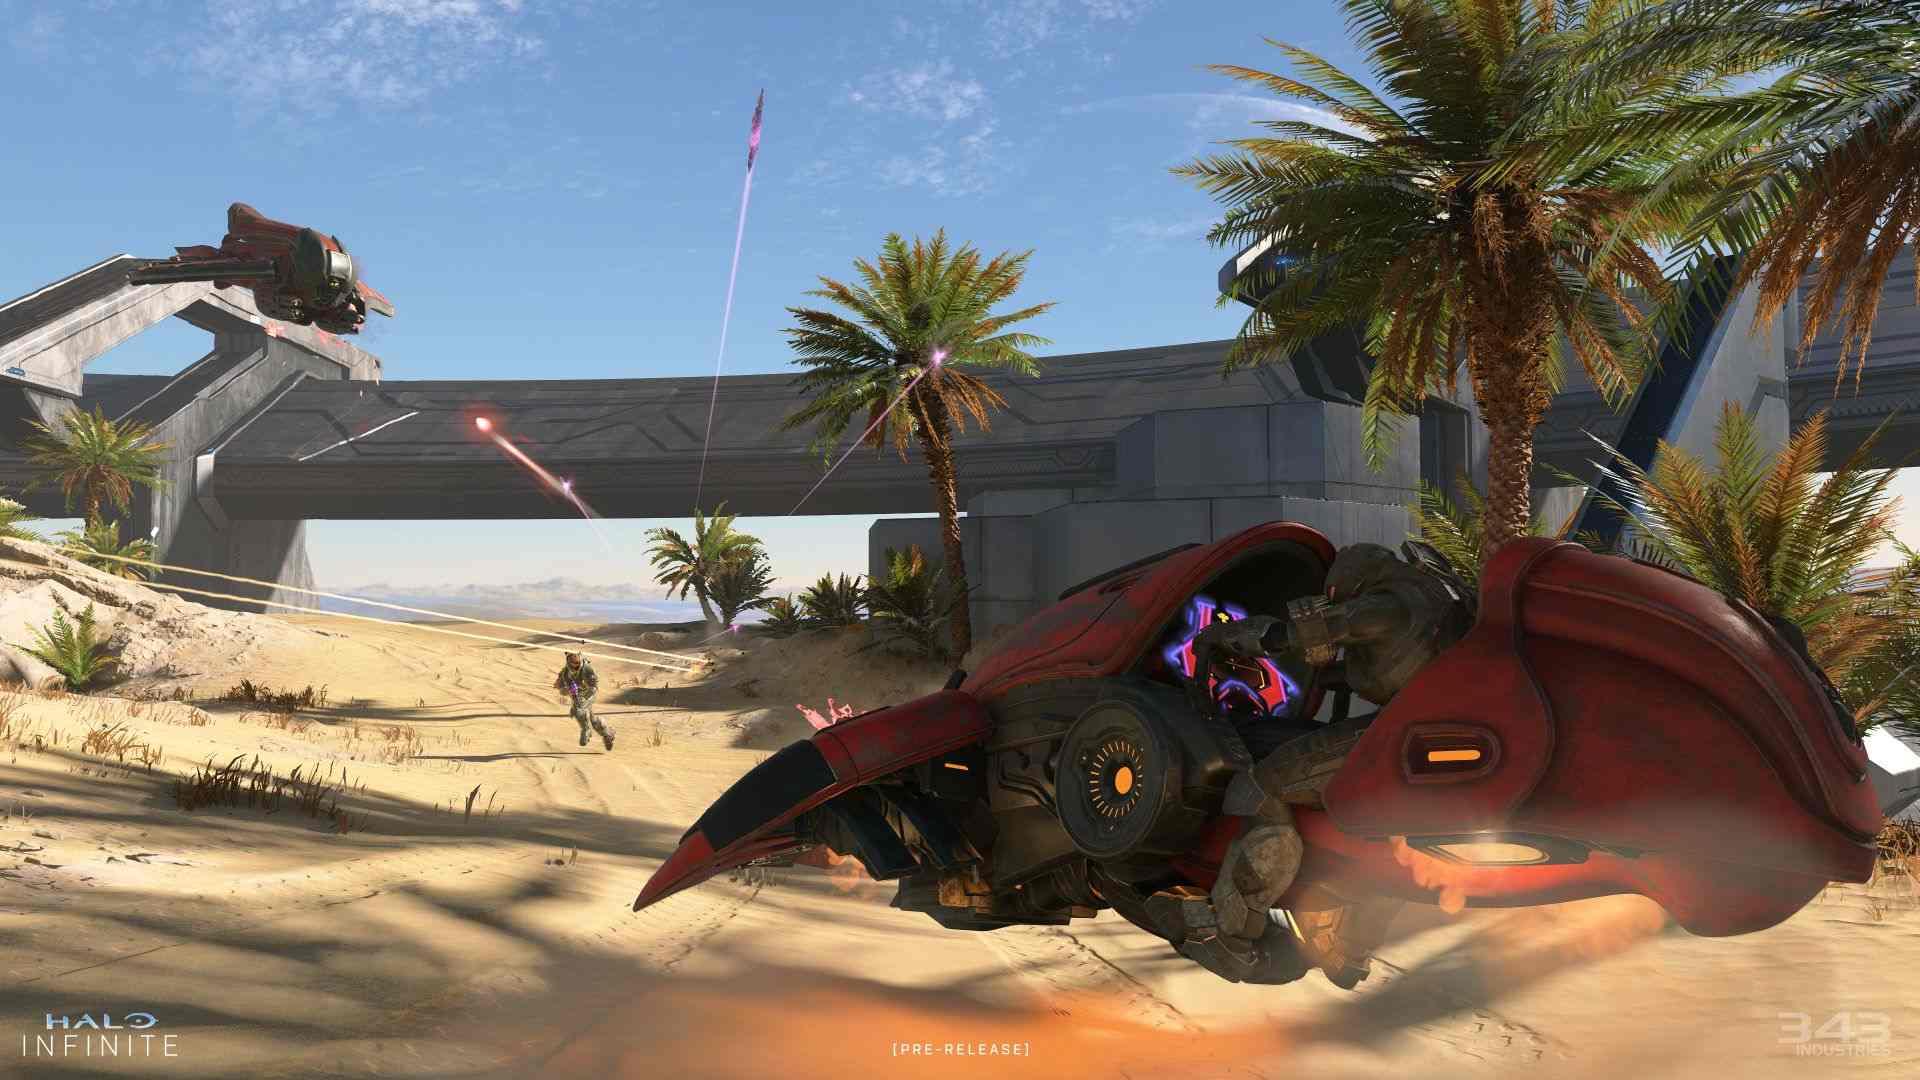 Halo Infinite Forge Mode